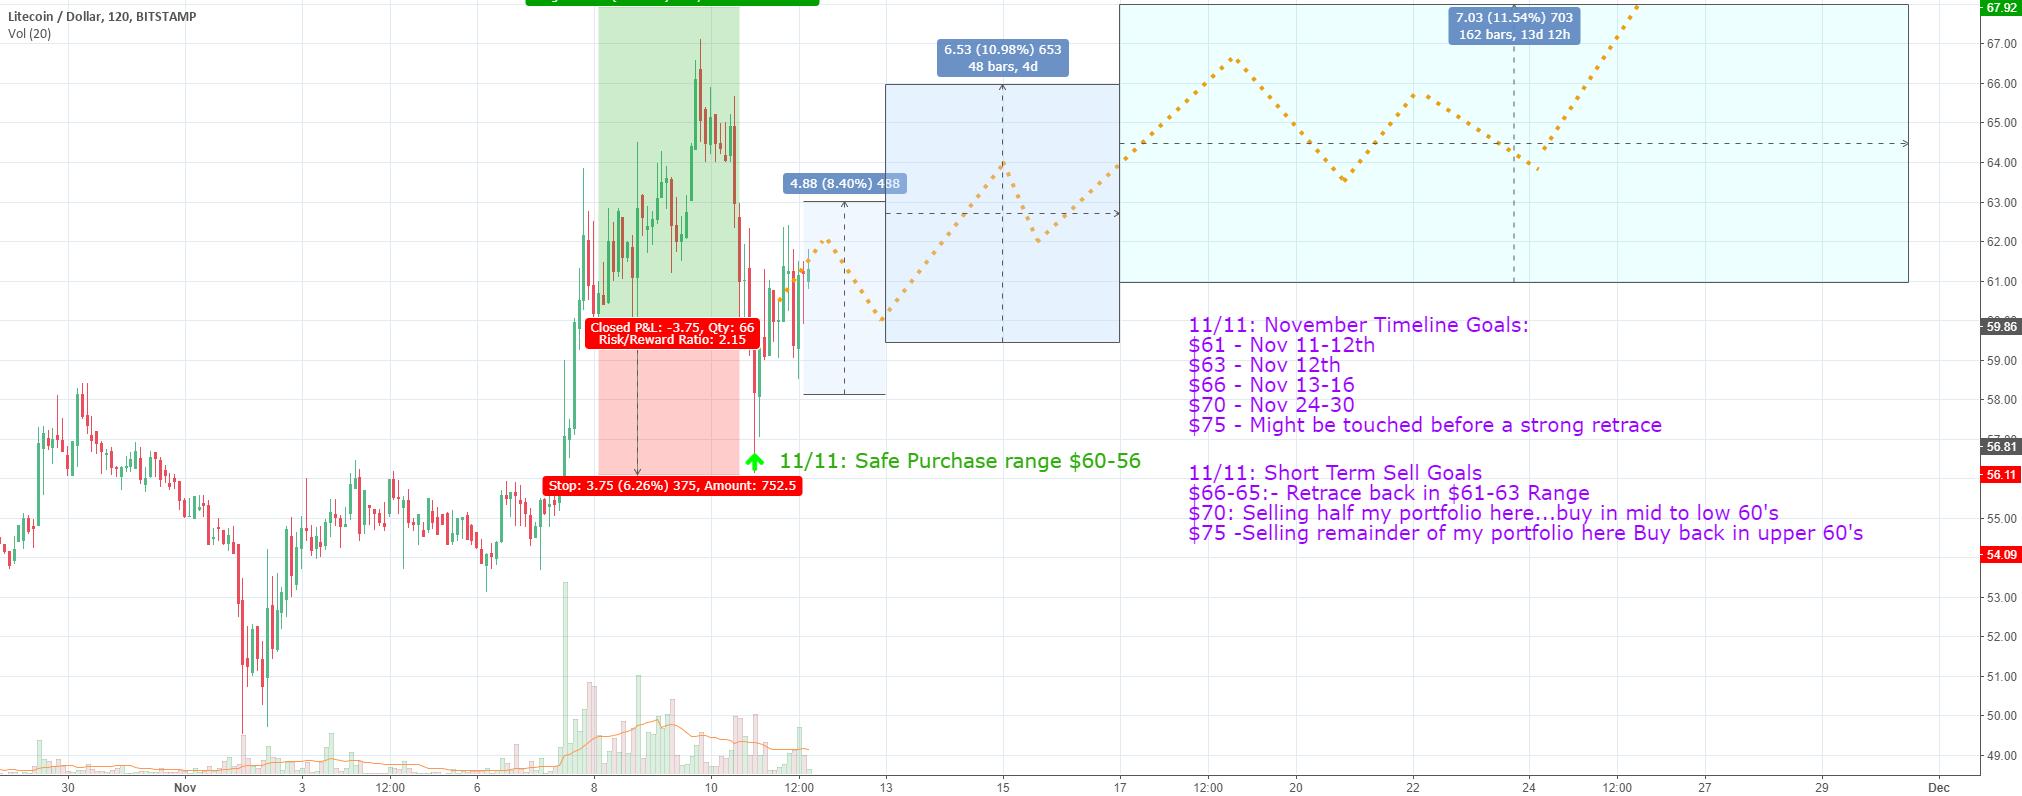 Litecoin November Price Predictions - Long/Short Term Goals